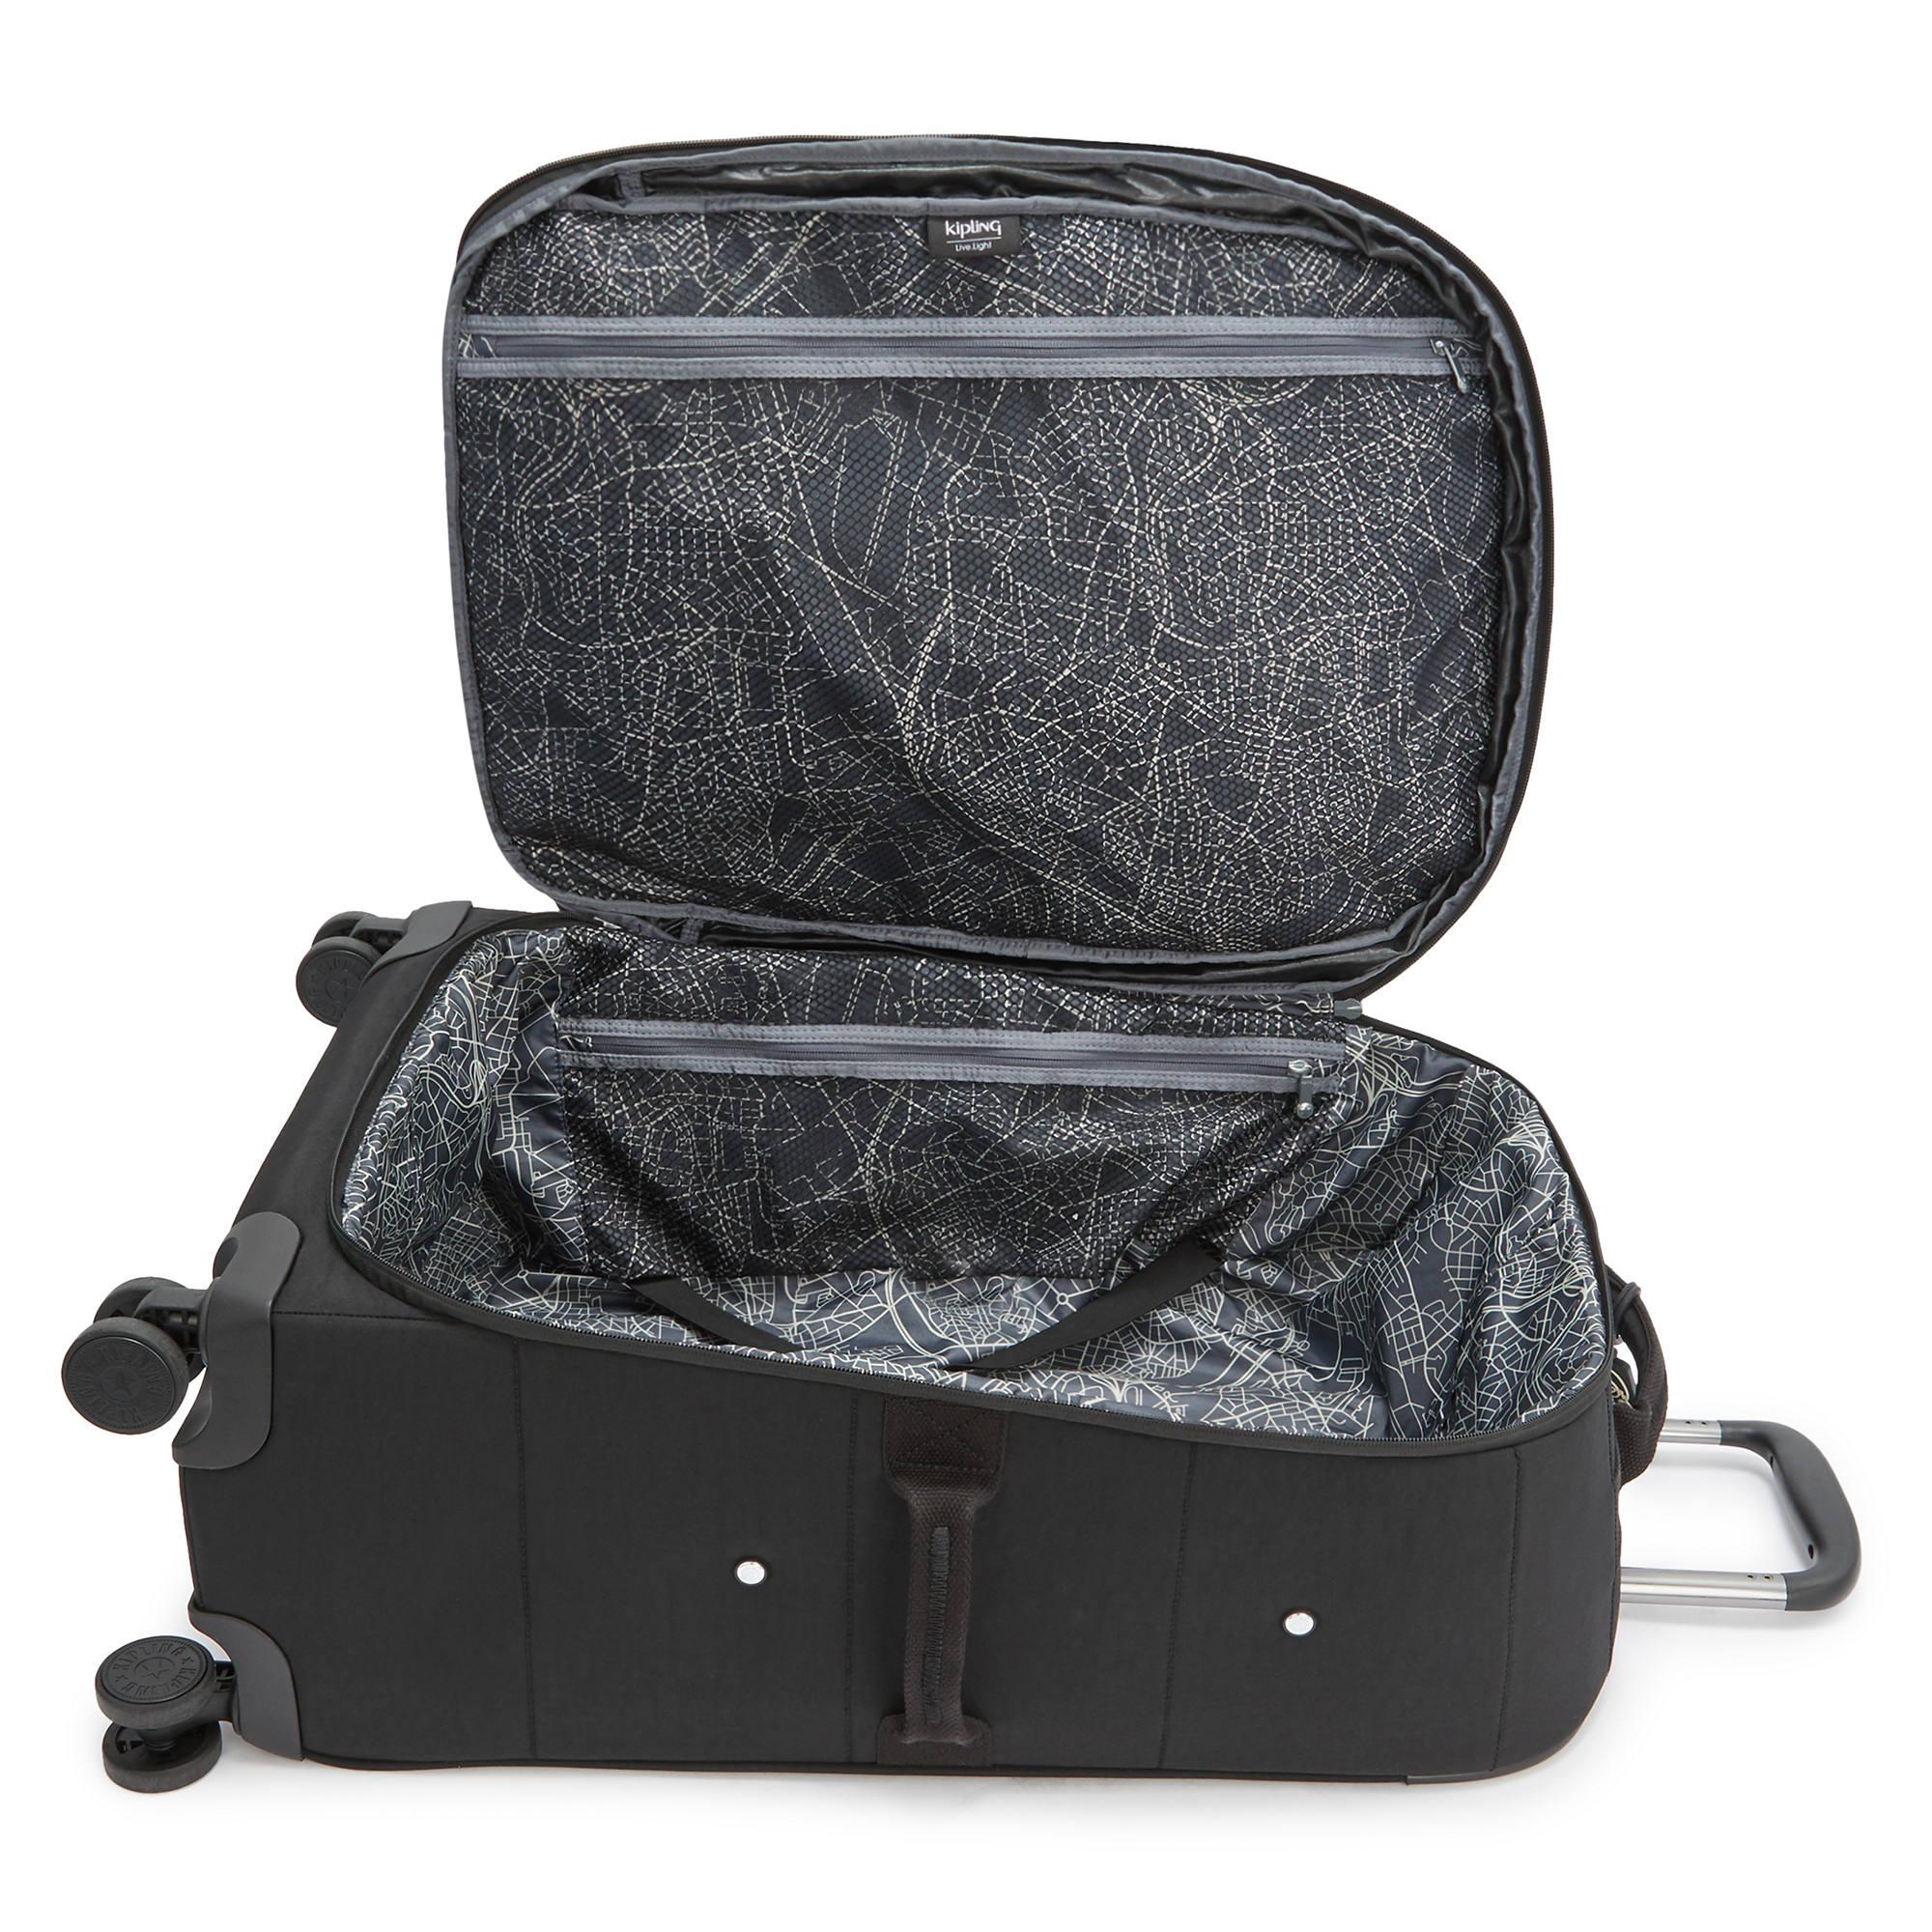 thumbnail 9 - Kipling City Spinner Medium Rolling Luggage